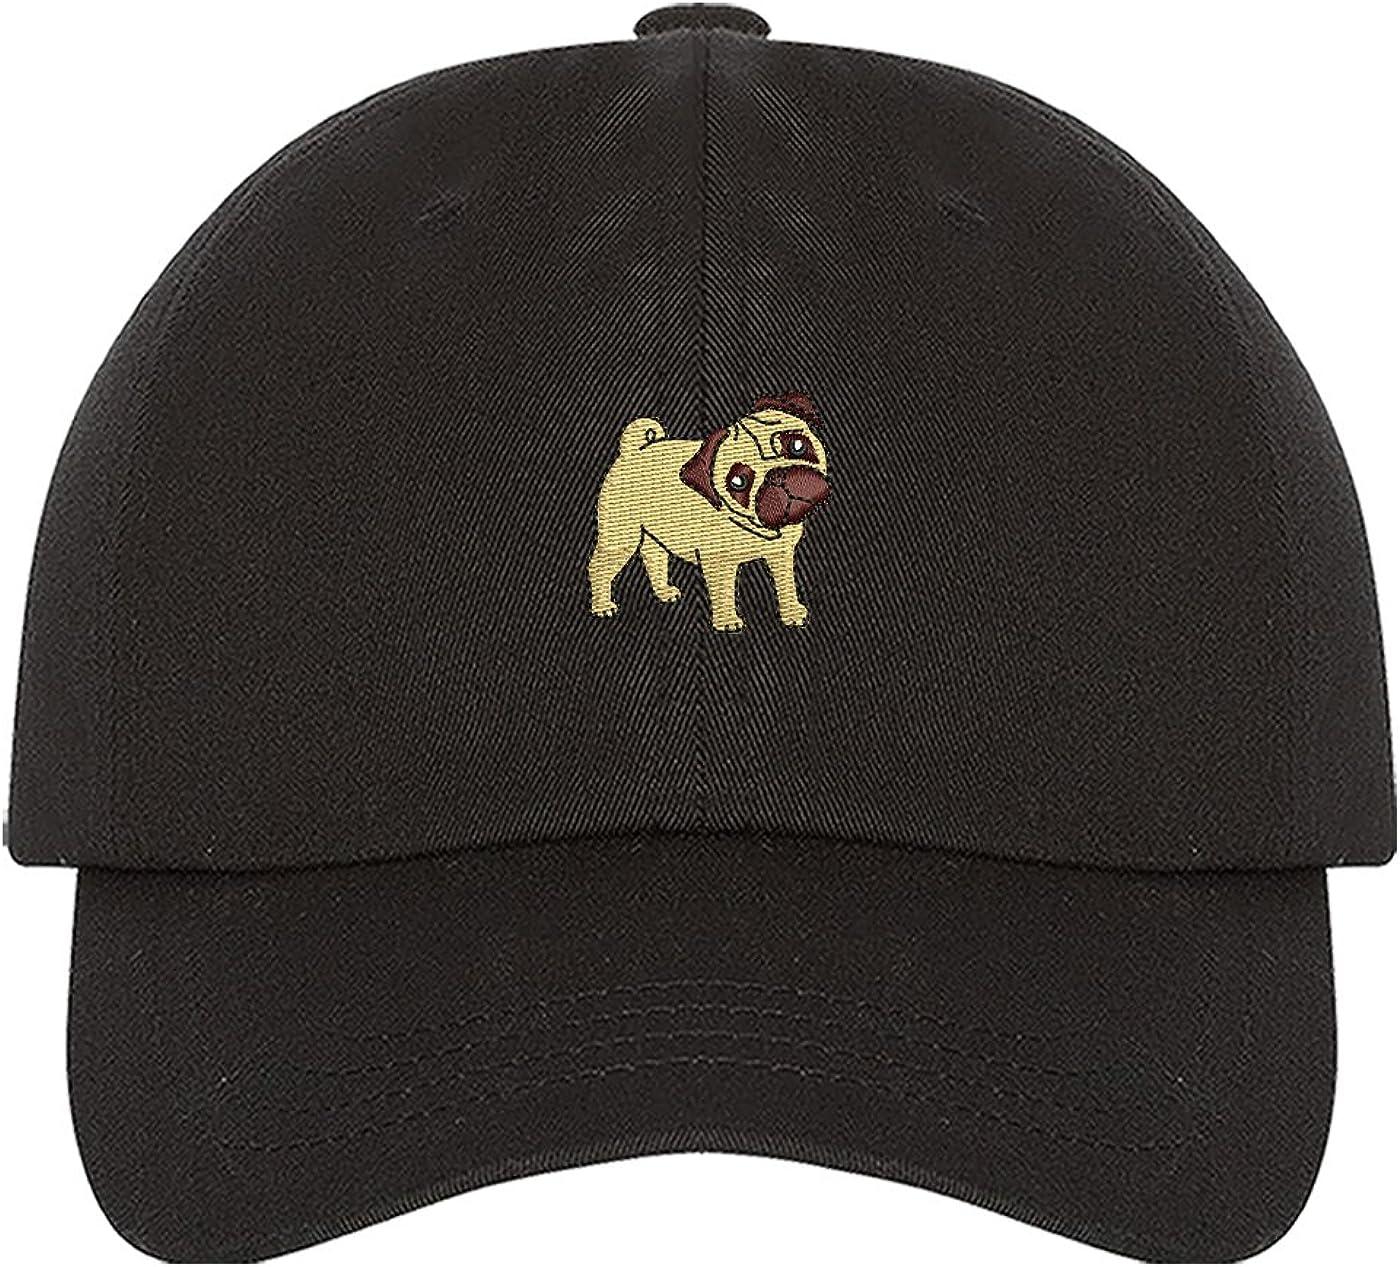 Prfcto Lifestyle Pug Dad Hat Baseball Cap